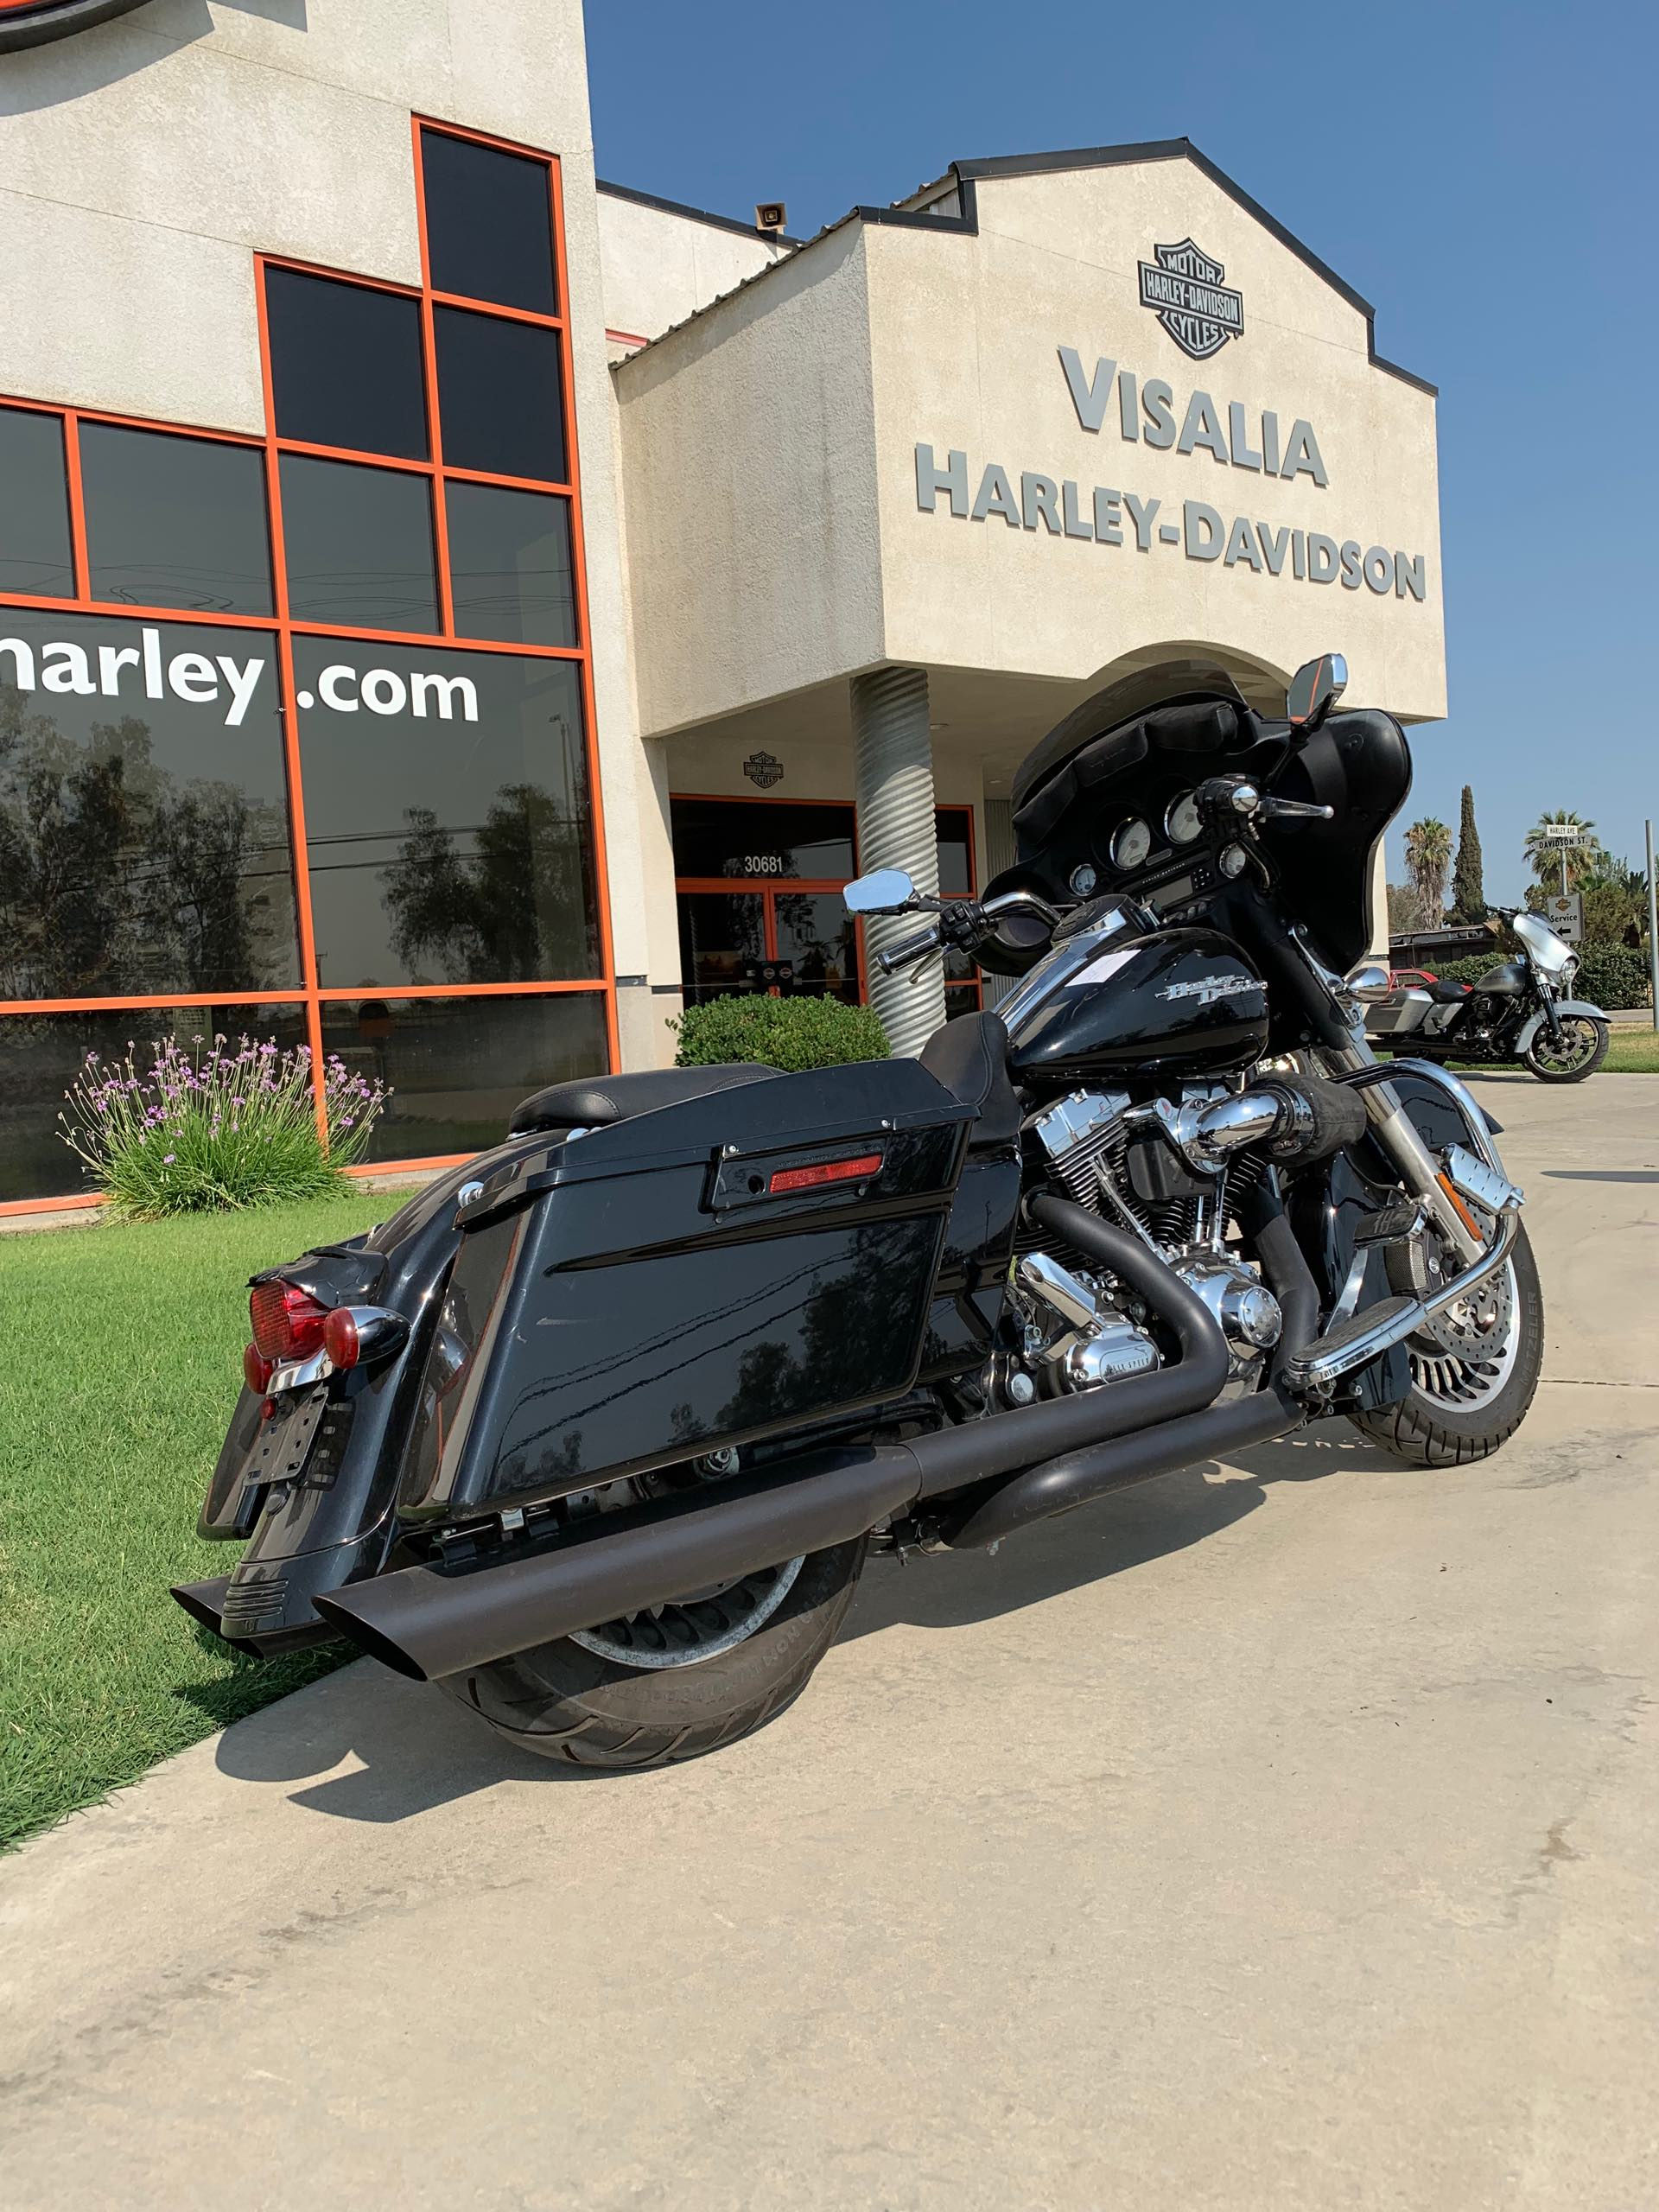 2009 Harley-Davidson Street Glide Base at Visalia Harley-Davidson